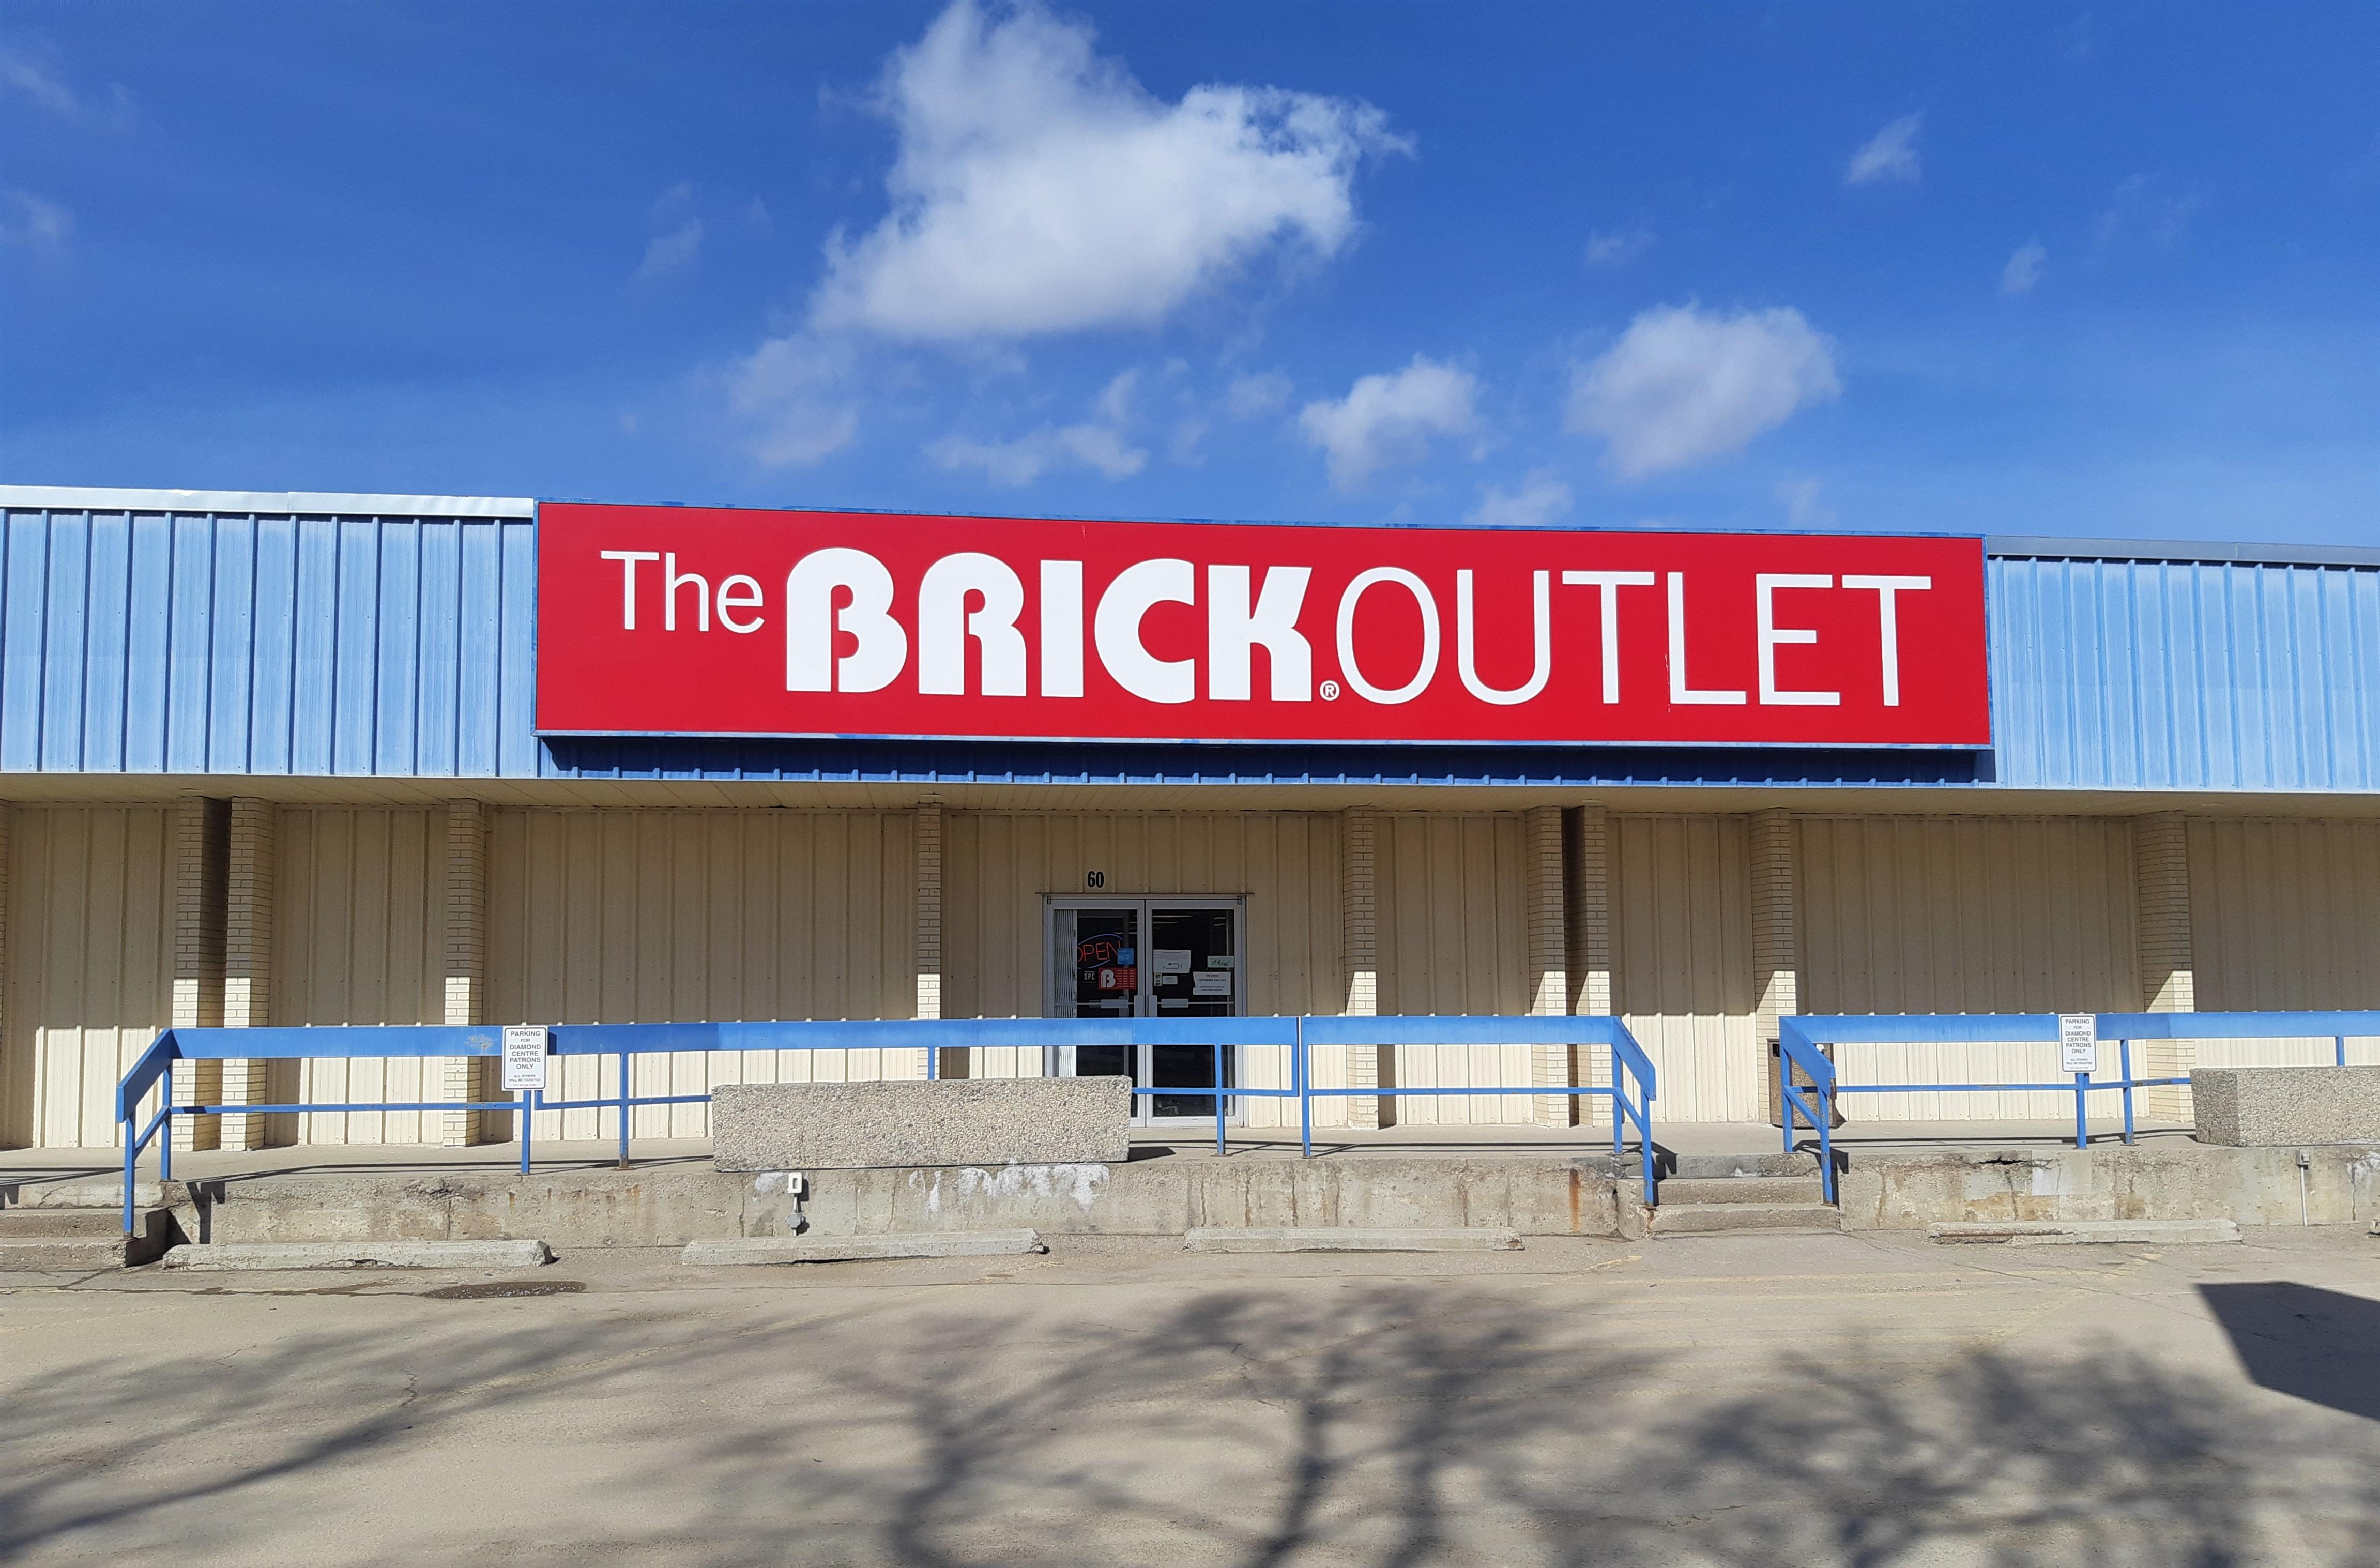 The Brick Outlet in Saskatoon